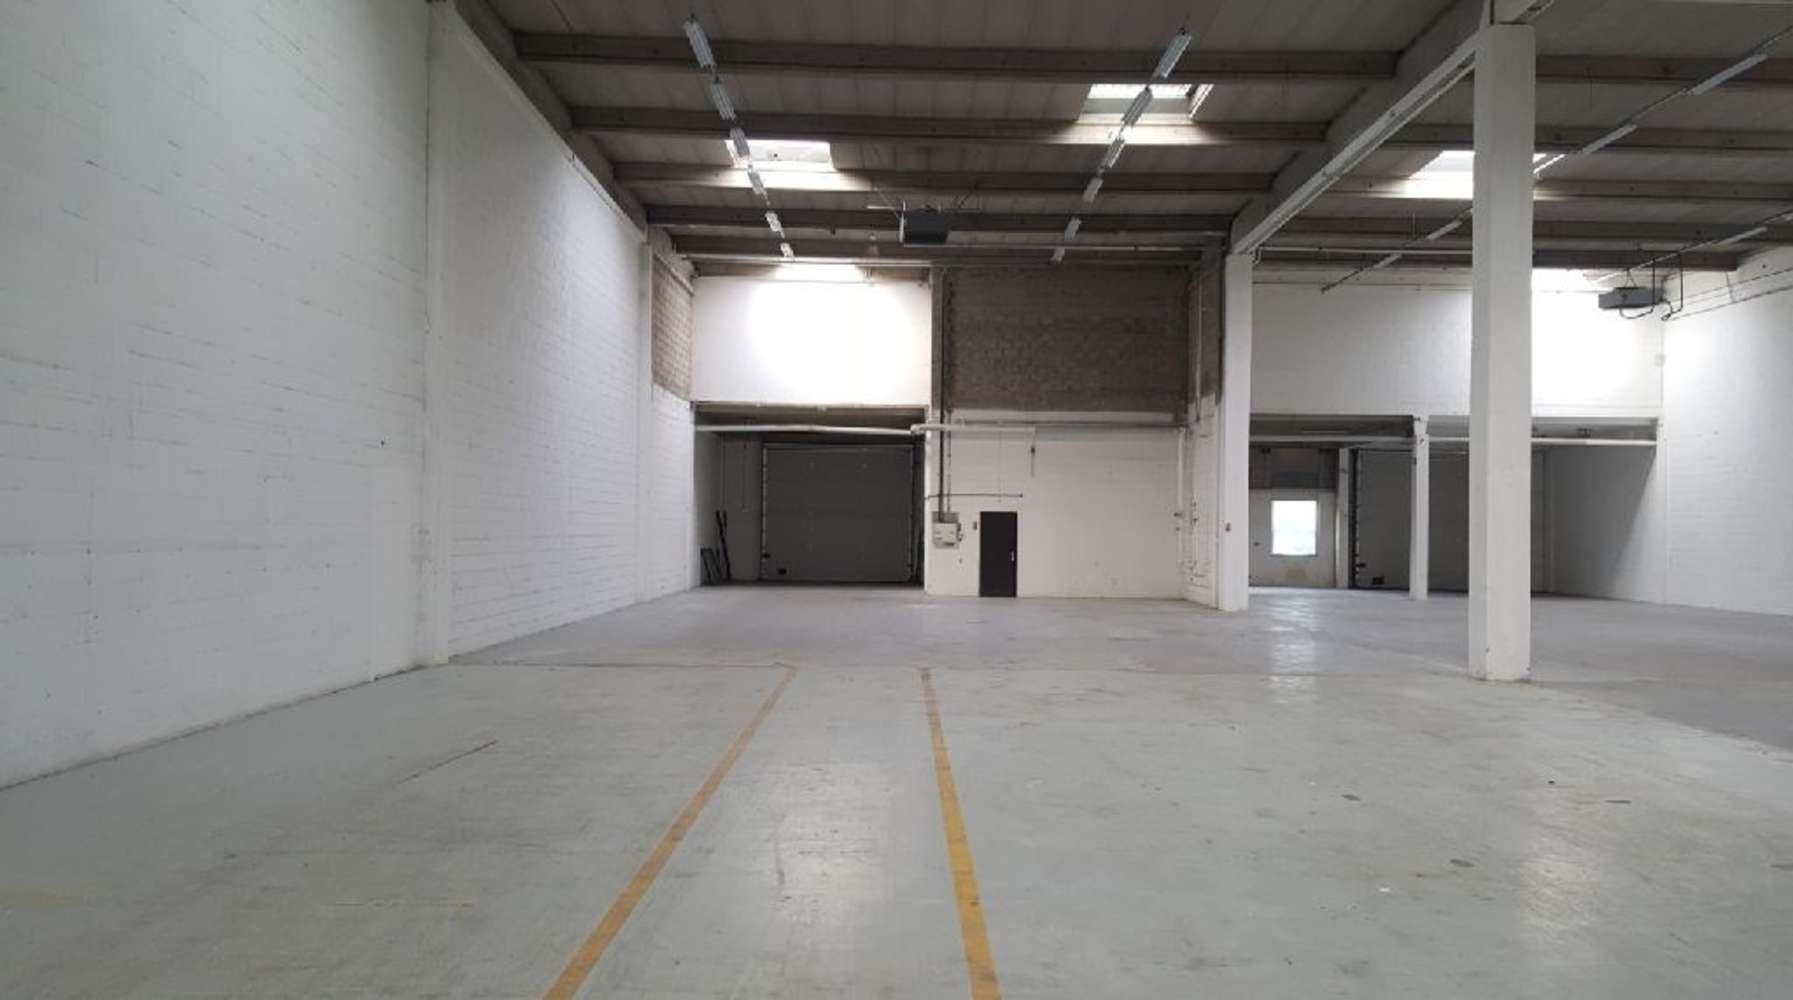 Activités/entrepôt Villebon sur yvette, 91140 - NEFLIER - 9520908